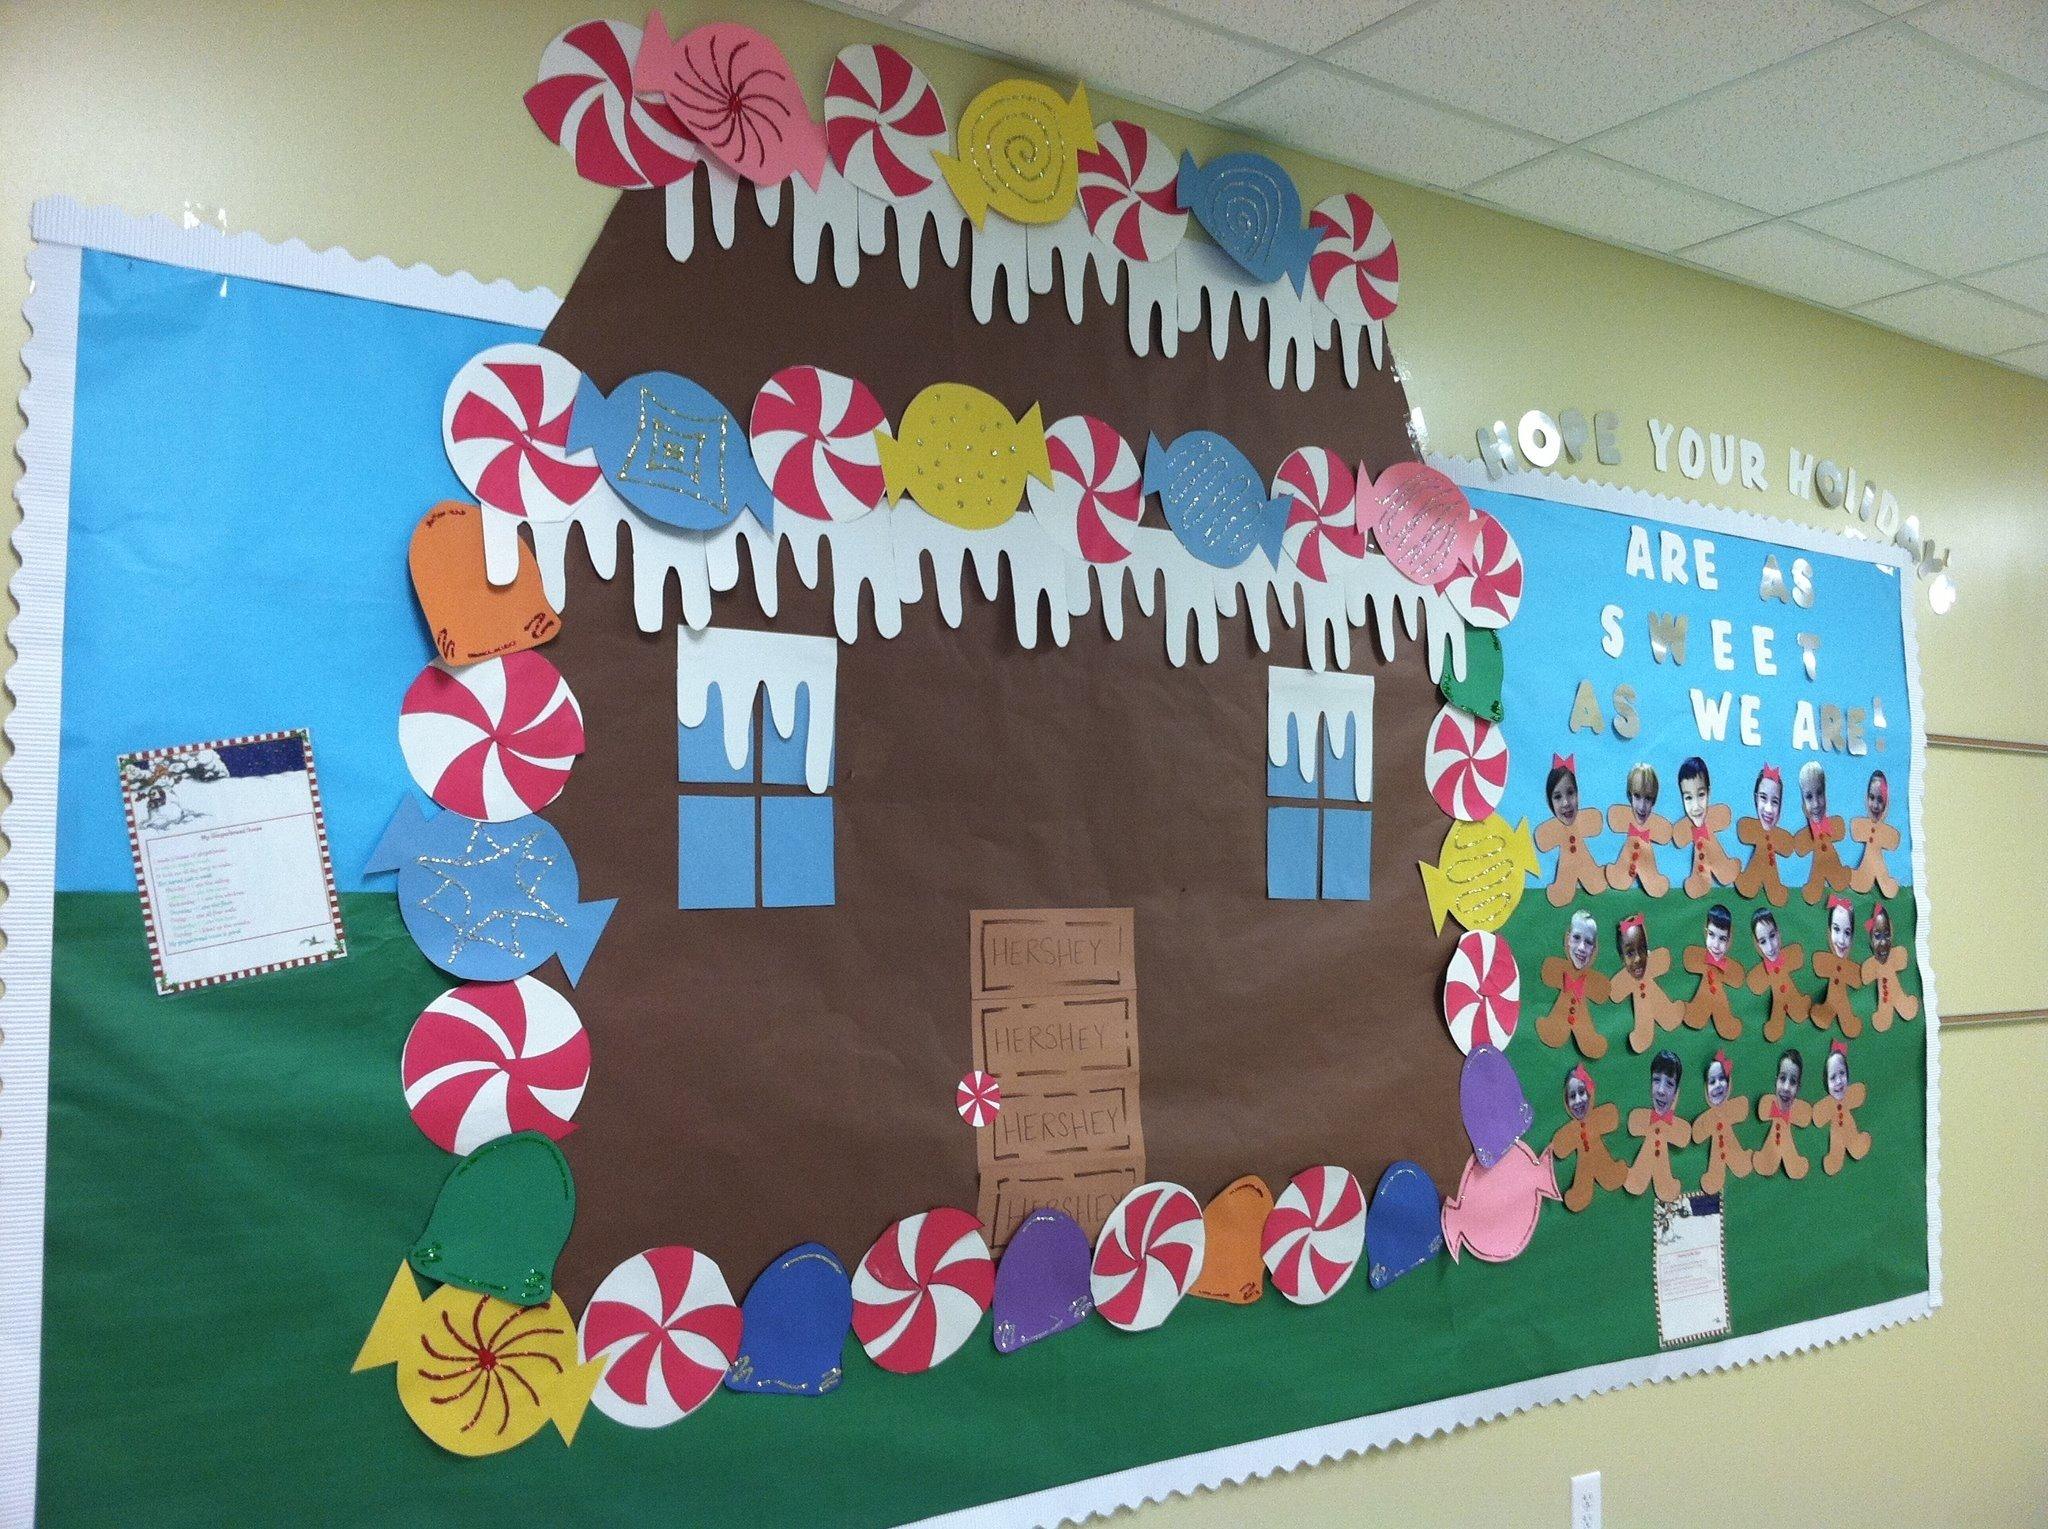 10 Gorgeous Winter Wonderland Bulletin Board Ideas winter bulletin board idea like the gingerbread housecaption 2021